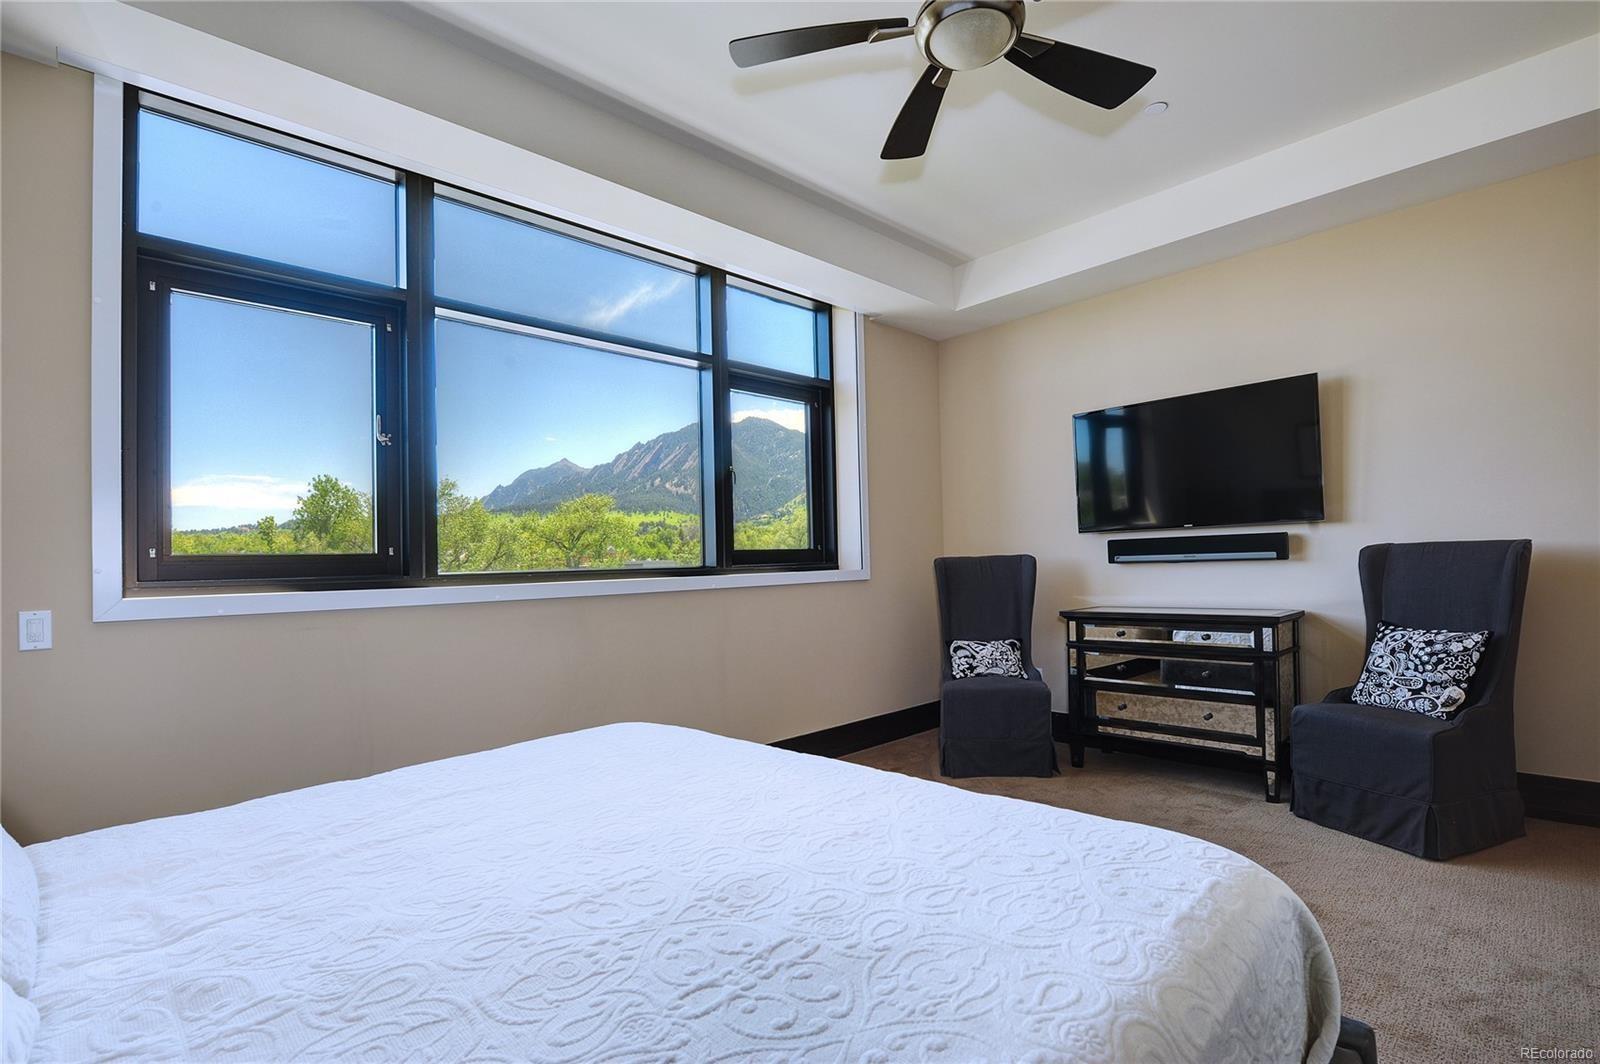 MLS# 8081755 - 17 - 1077 Canyon Boulevard #302, Boulder, CO 80302